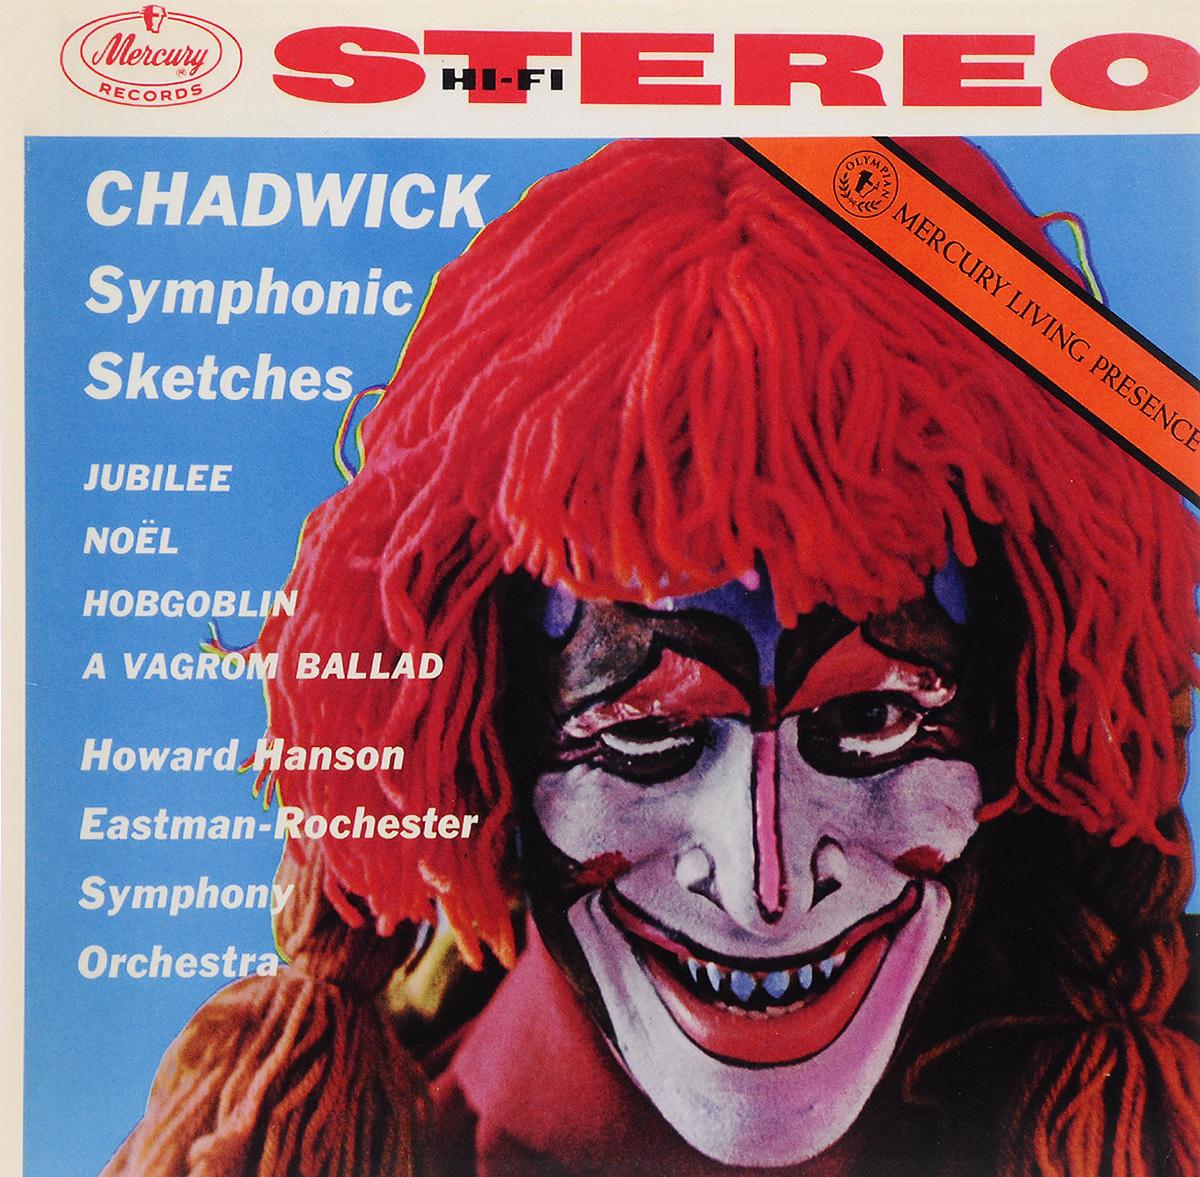 лучшая цена Ховард Хэнсон,Eastman-Rochester Symphony Orchestra Hanson. Chadwick: Symphonic Sketches (LP)